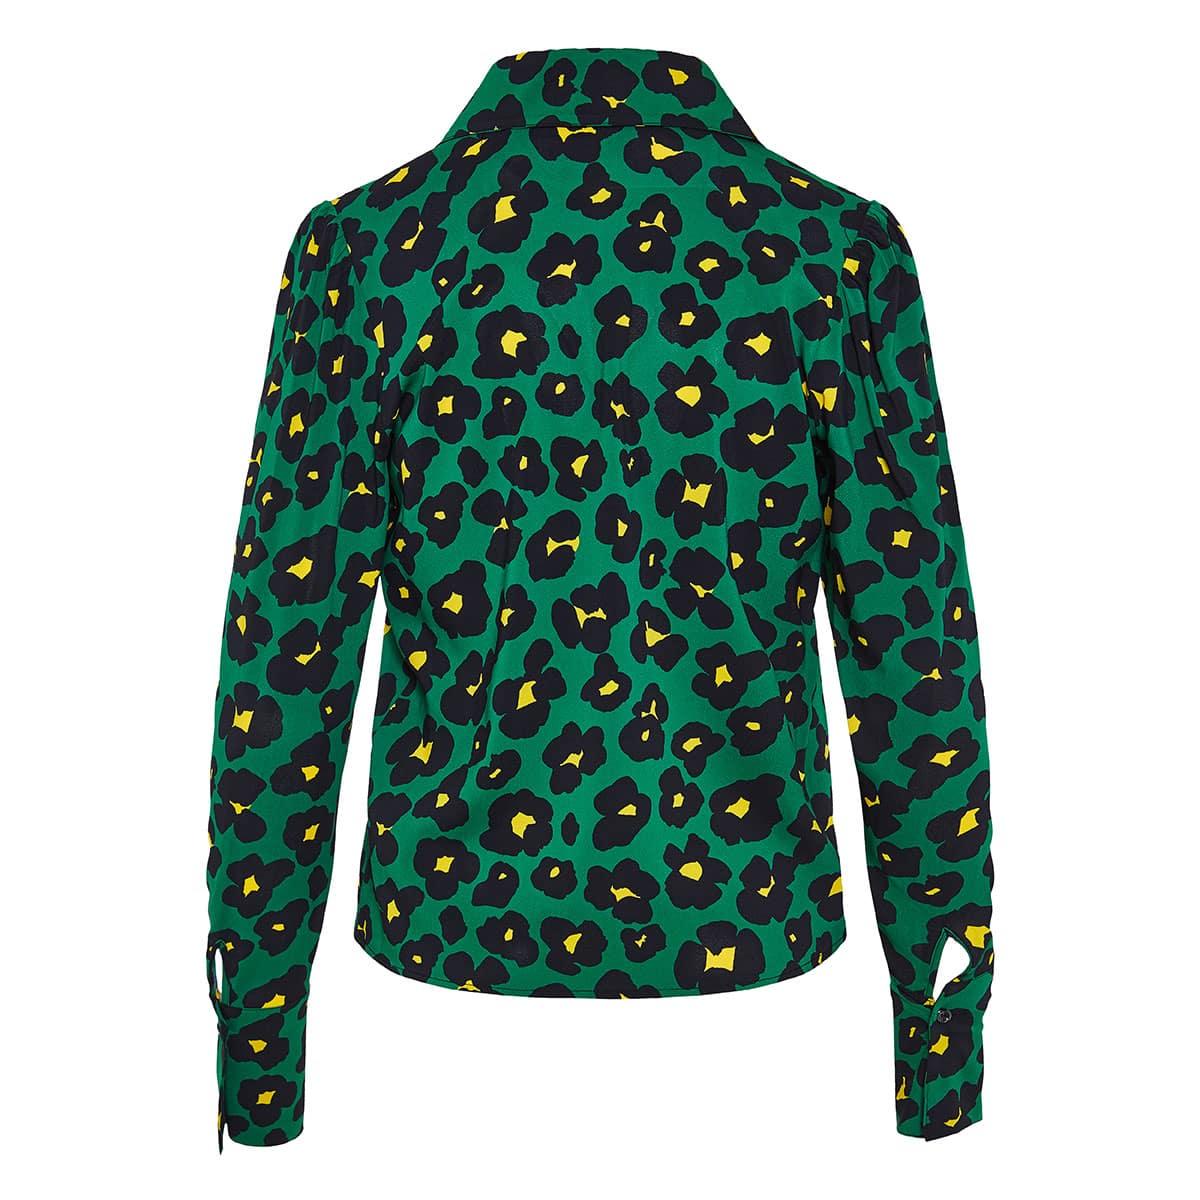 Viola printed shirt